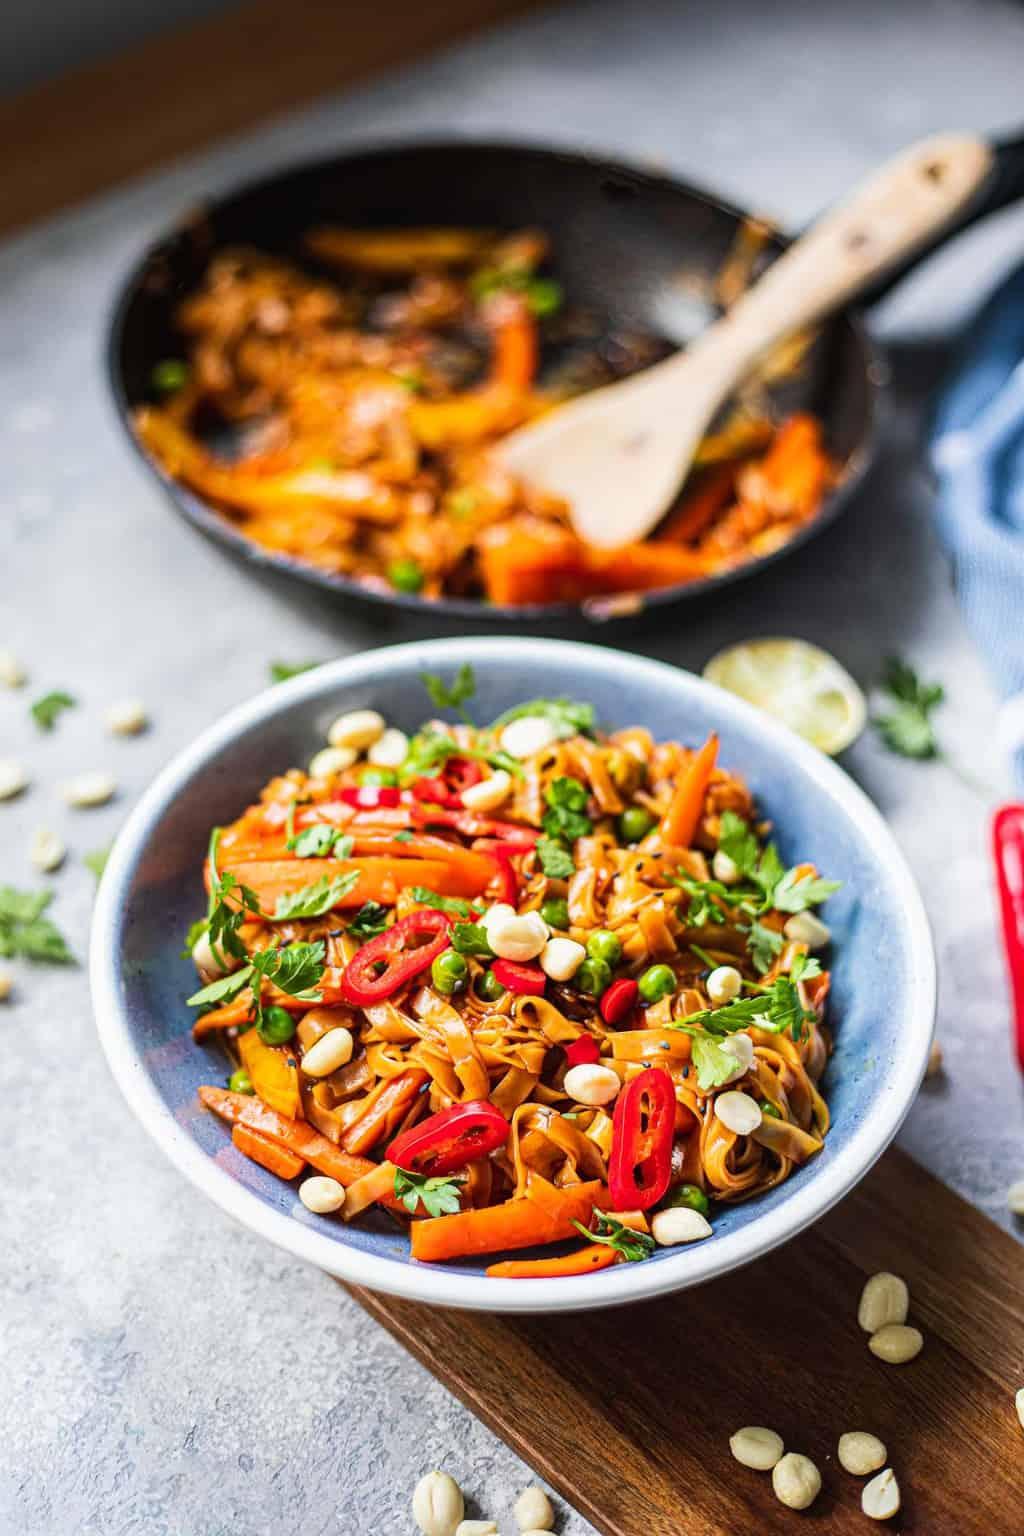 Bowl of vegan Pad Thai with carrots